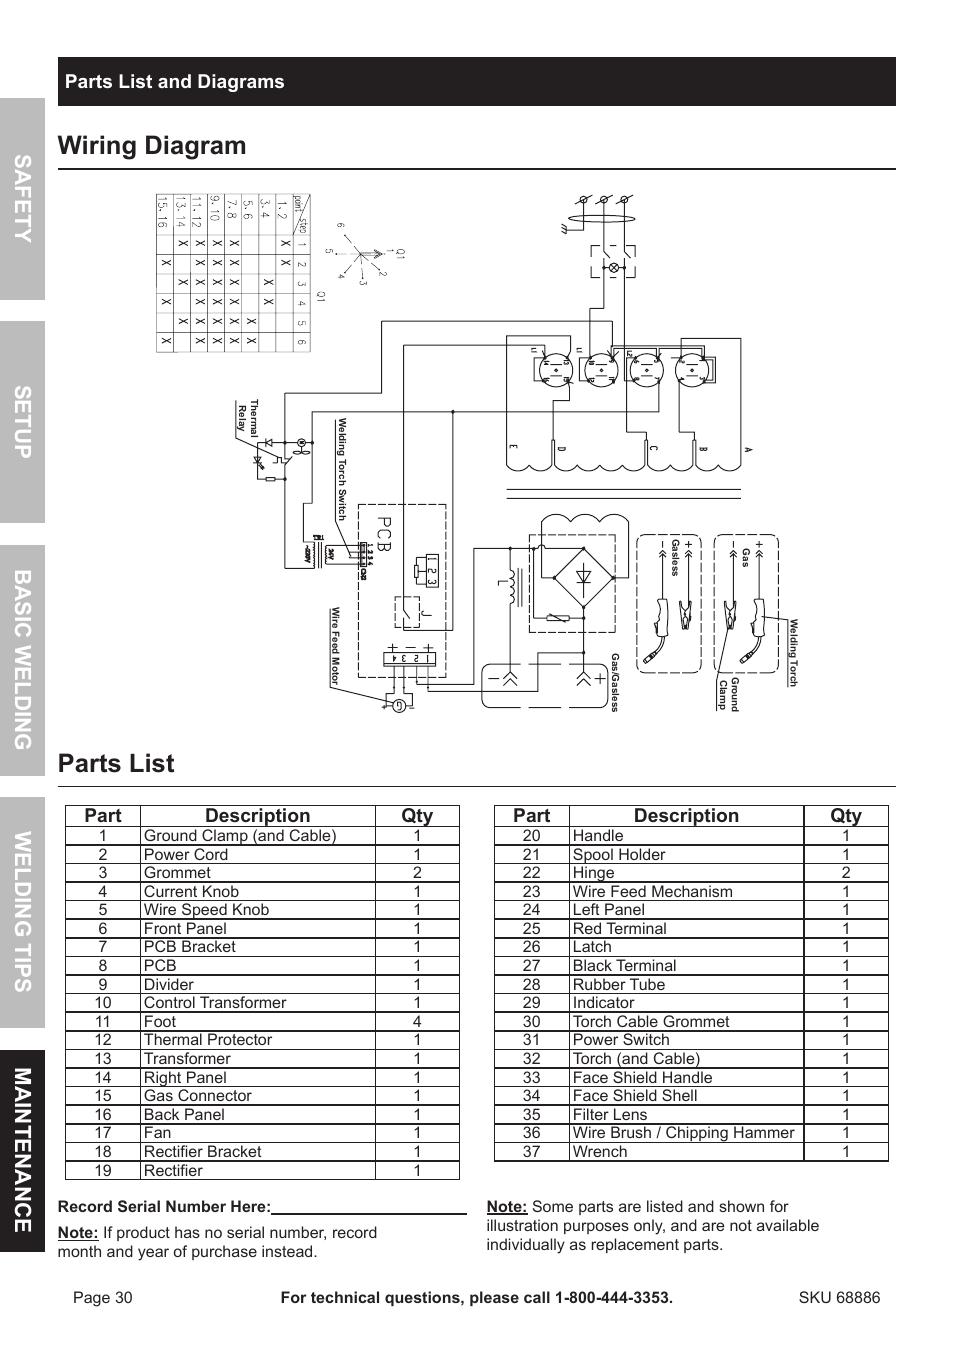 Diagram 3 Wire Welder Wiring Diagram Full Version Hd Quality Wiring Diagram Ilikeiphone Ristorantepizzeriaanna It